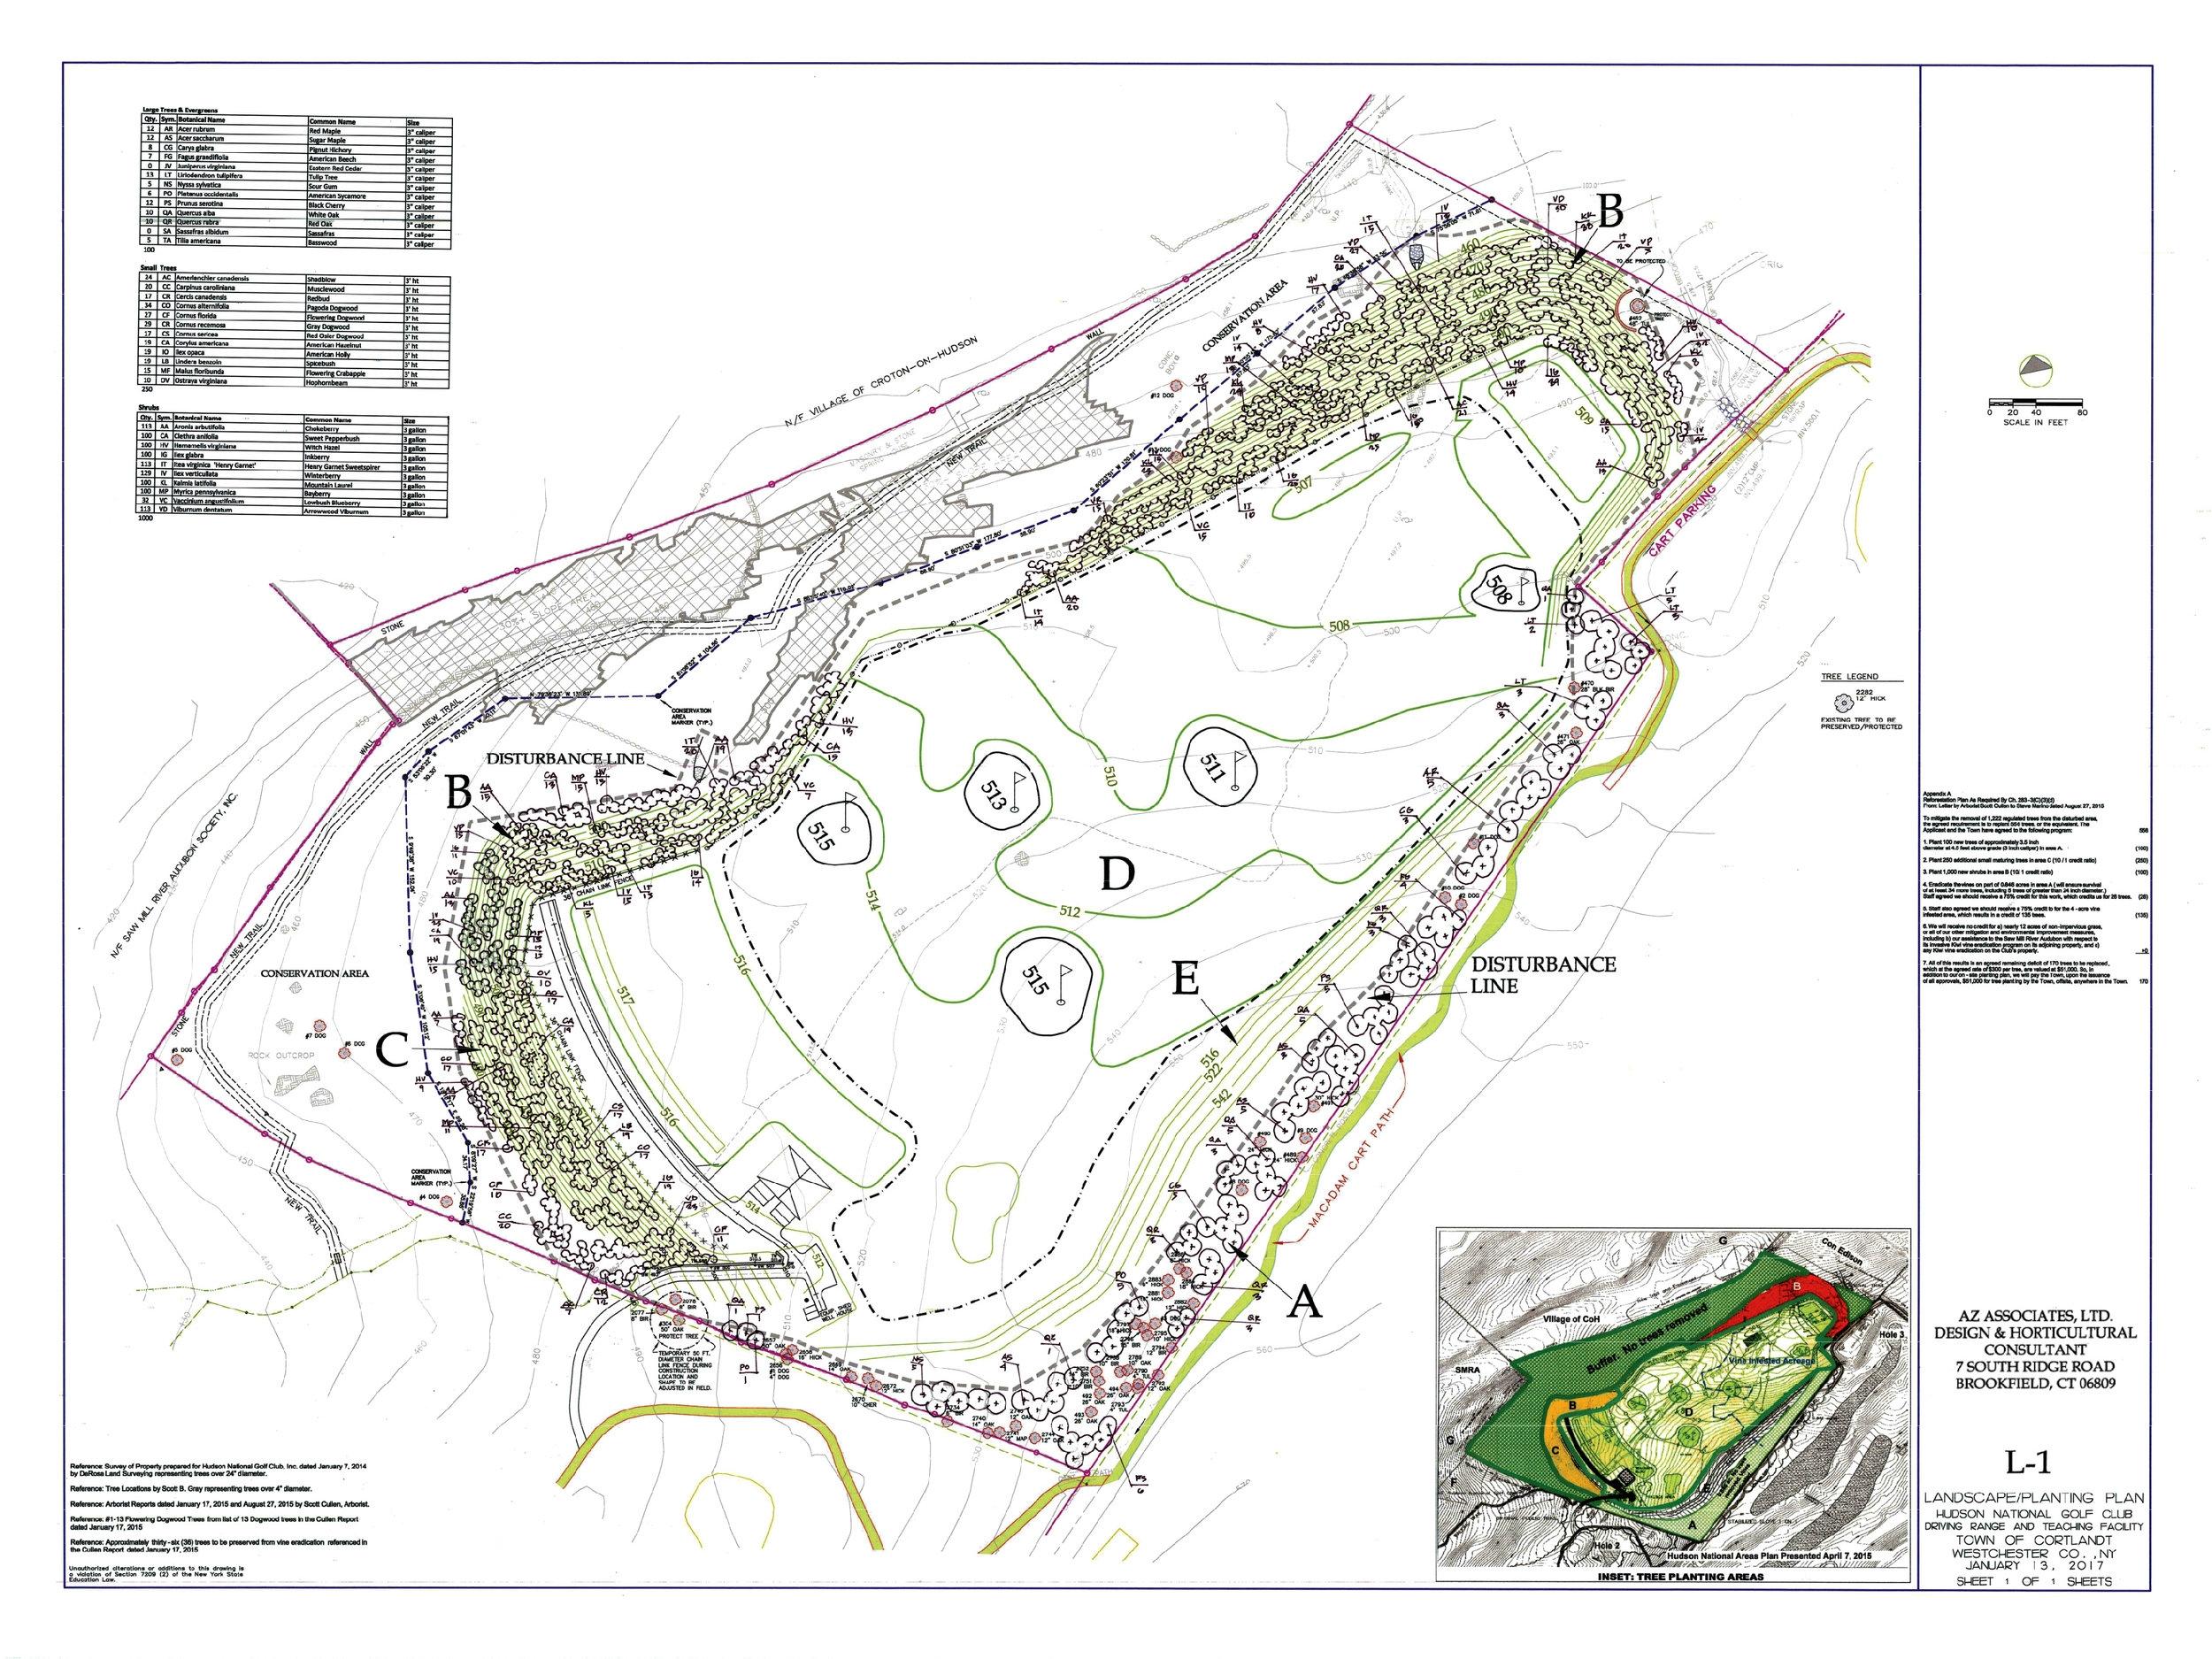 Croton on Hudson planting plan